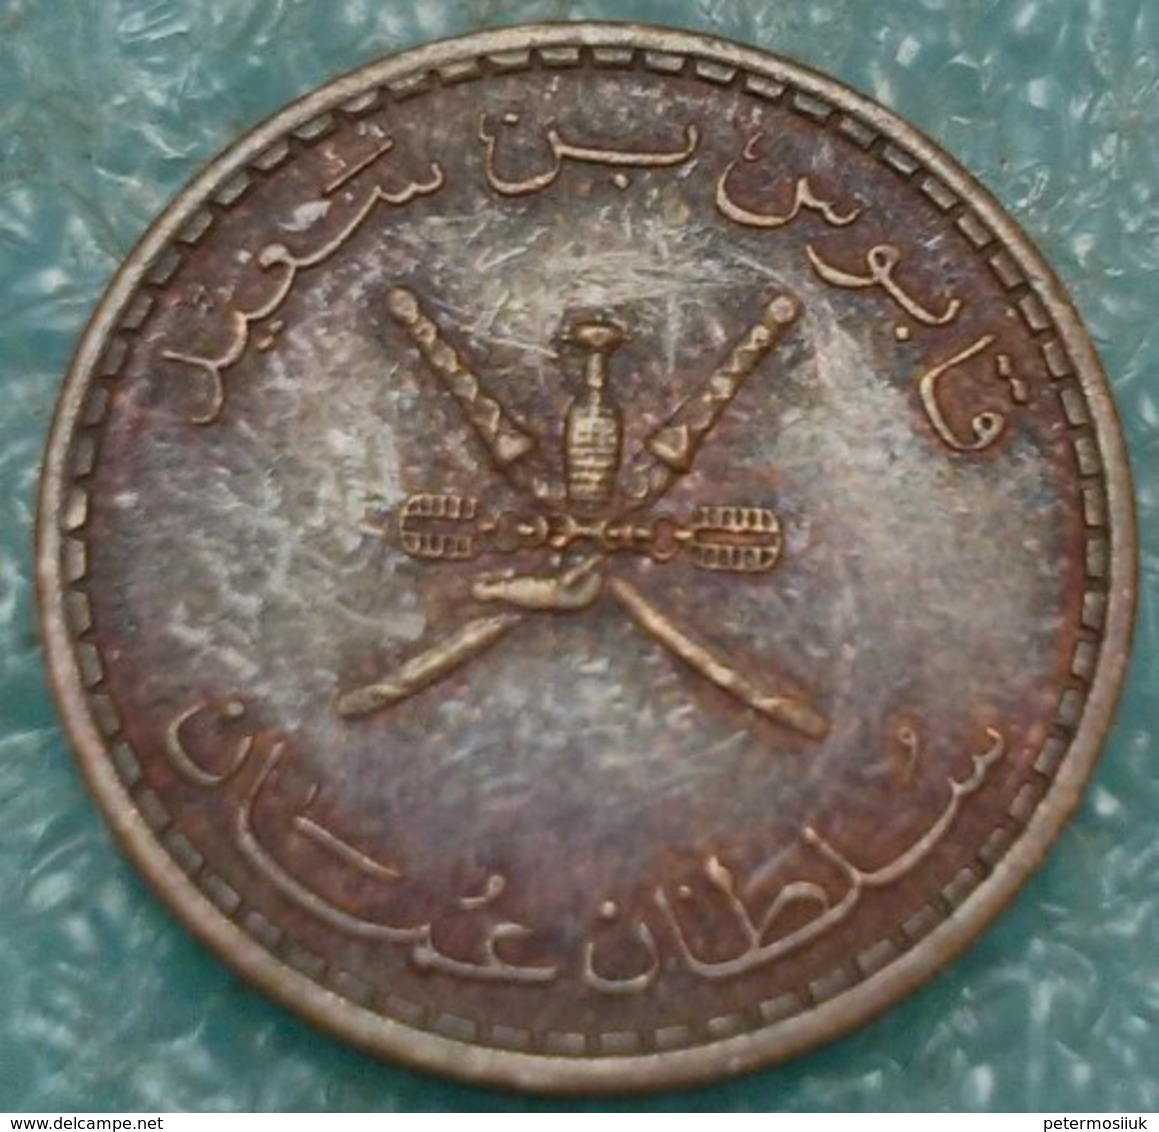 Oman 5 Baisa, 1400 (1980) -4538 - Oman